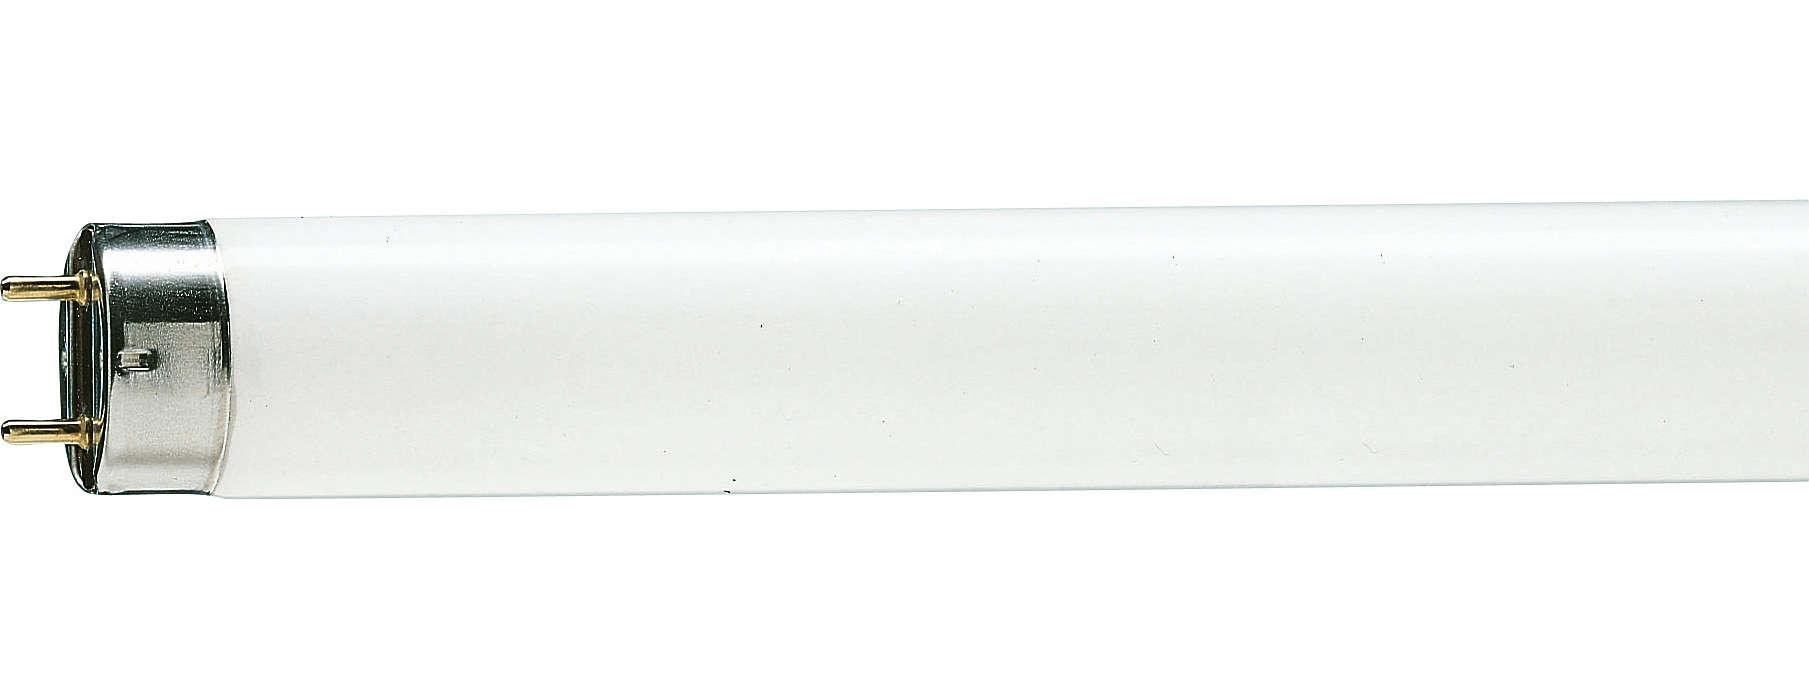 MASTER TL-D 90 De Luxe